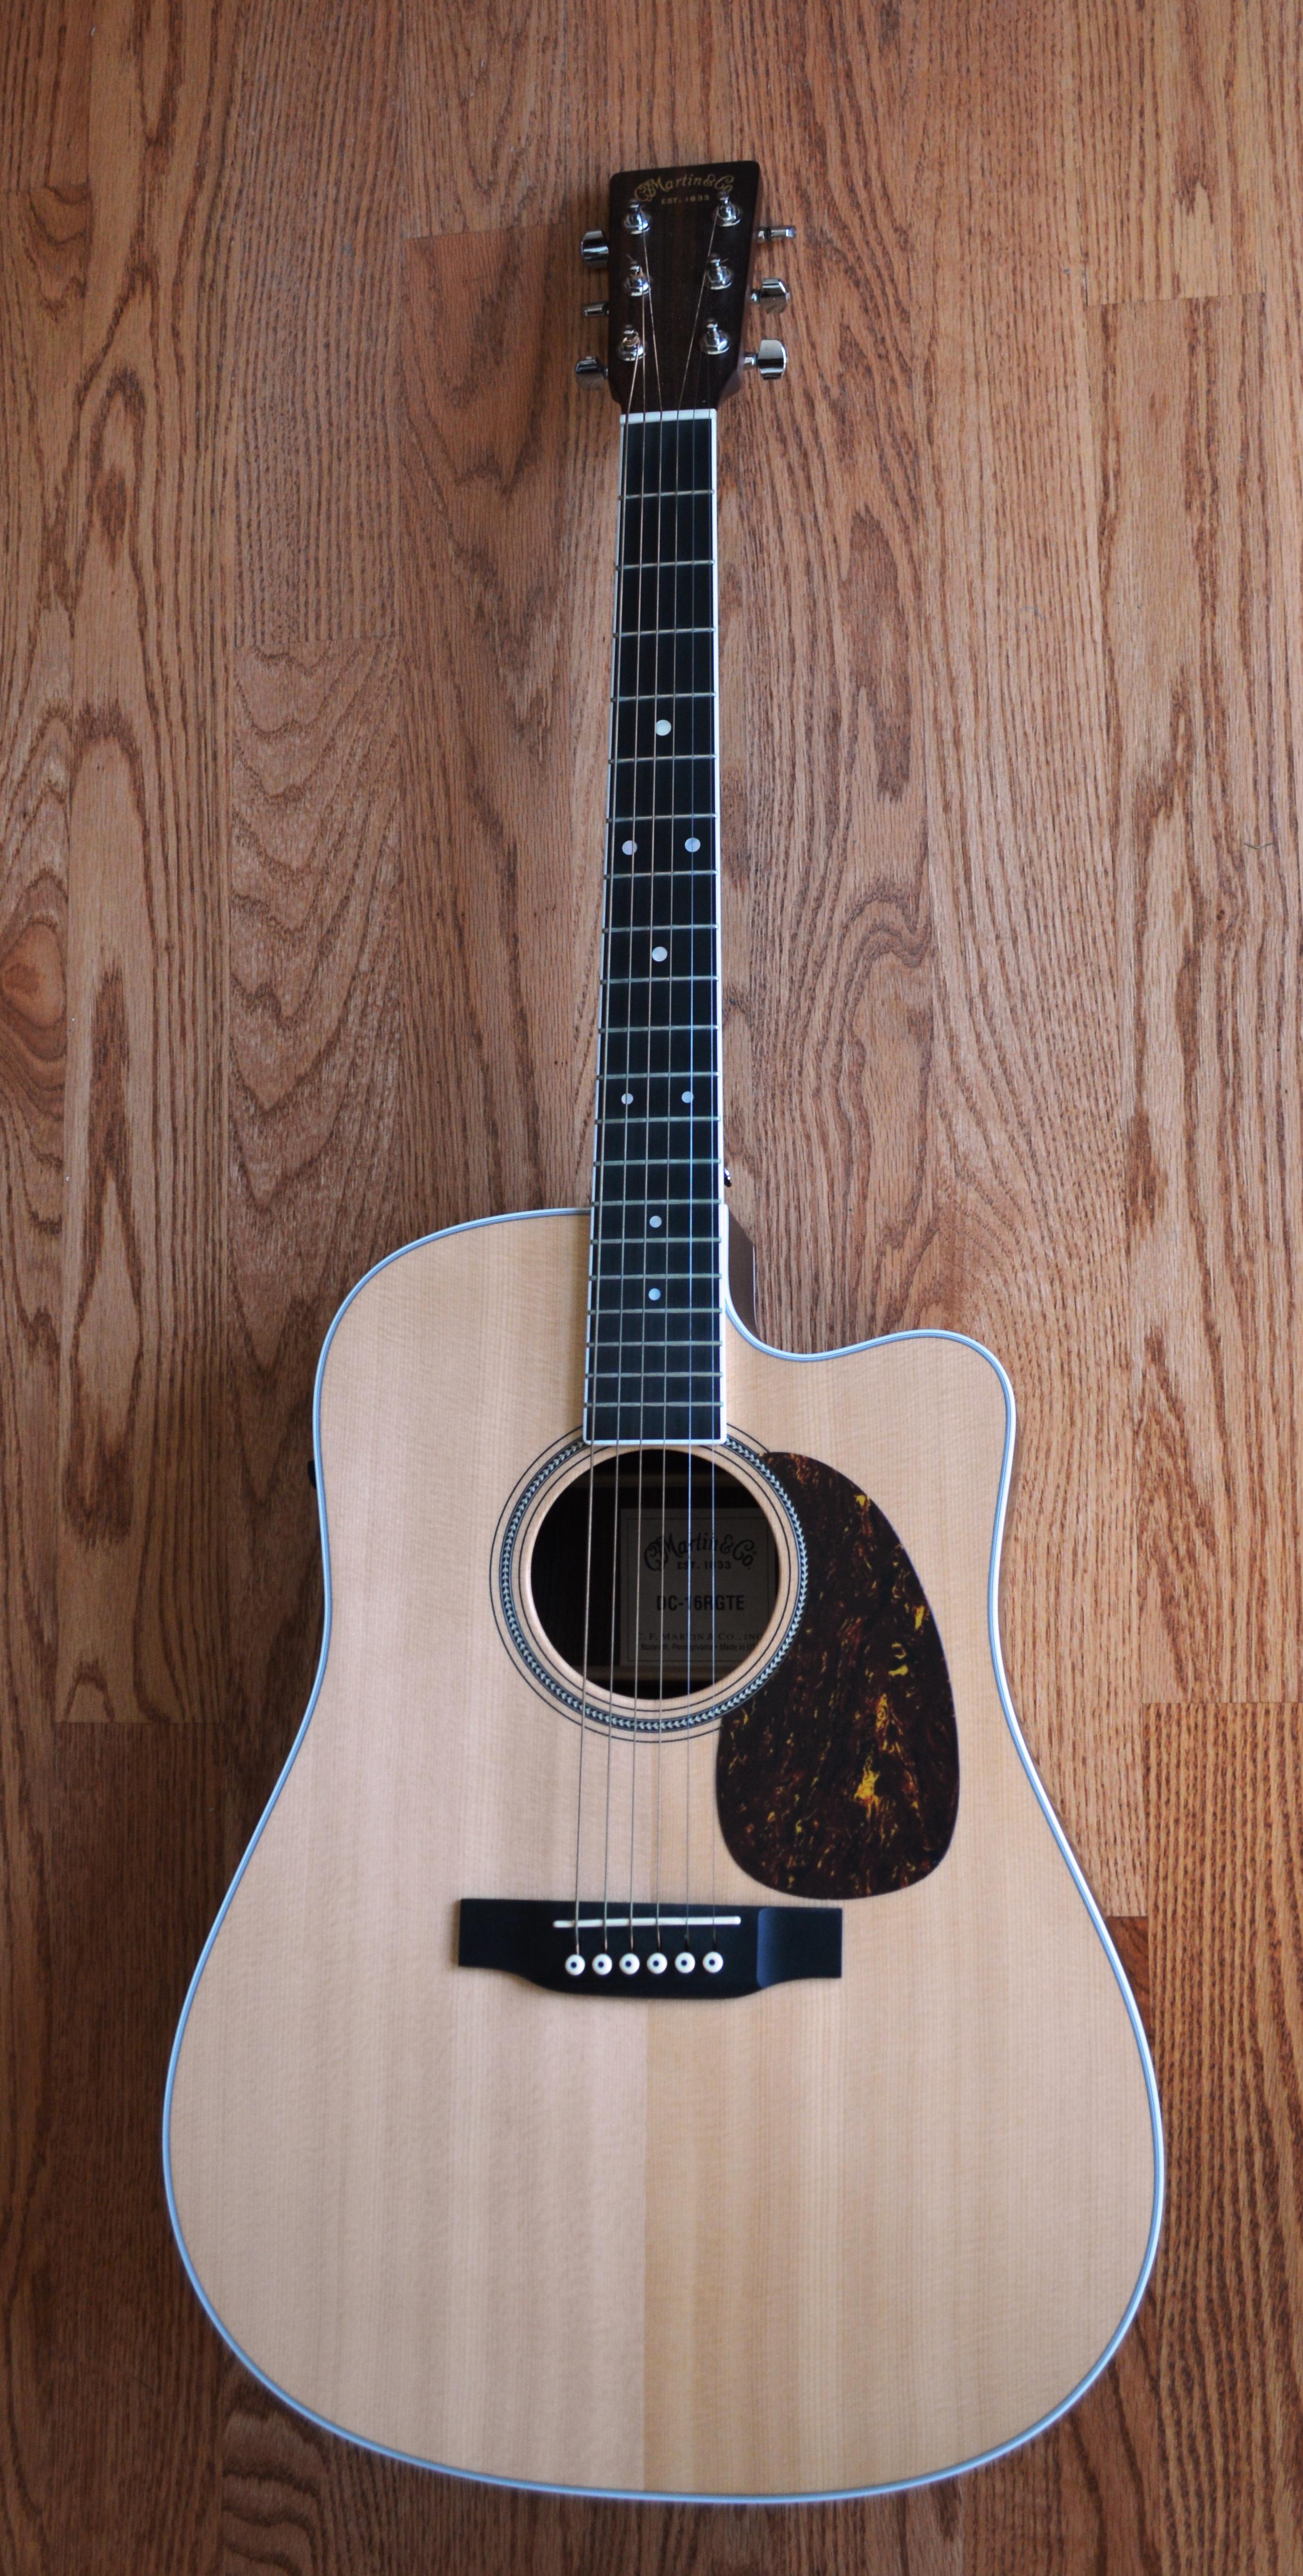 Martin D16-RGTE Acoustic Dreadnought Guitar